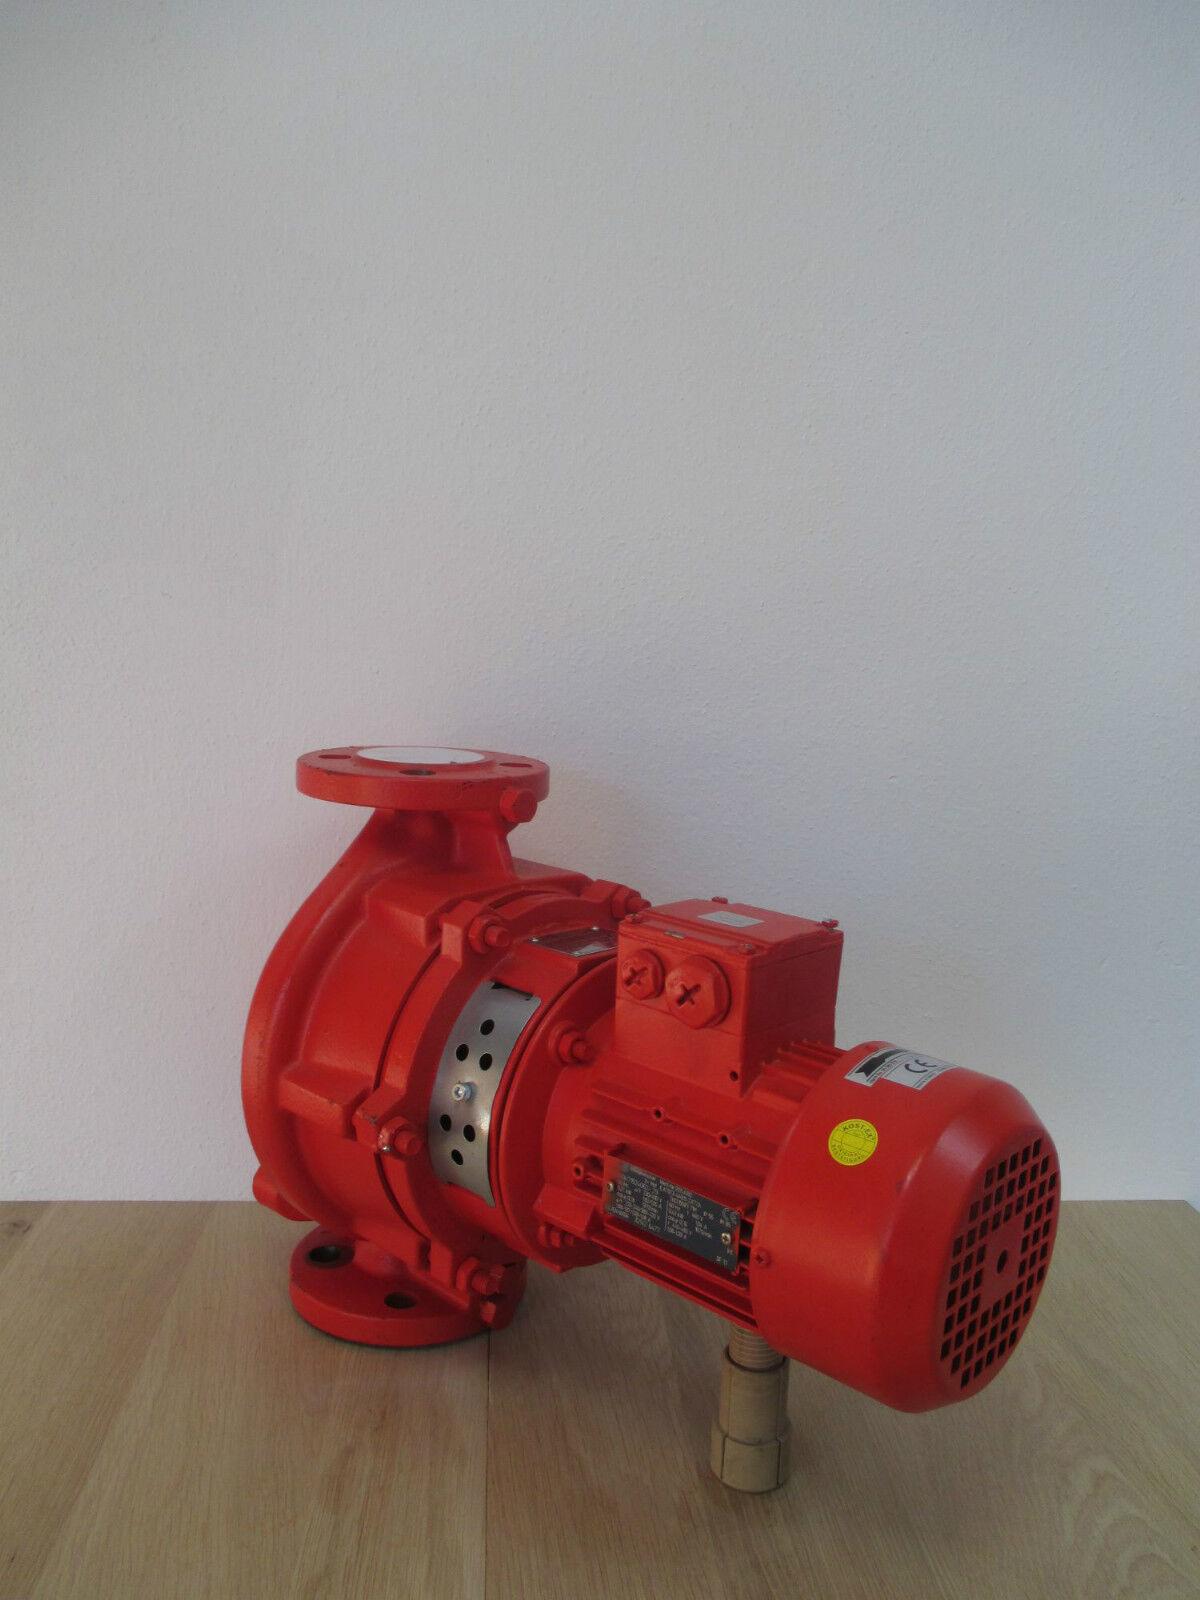 Pumpe KSB Etaline GN 032 - 160   034 G11 Kreiselpumpe  3x400 V   DN 32  P16 399